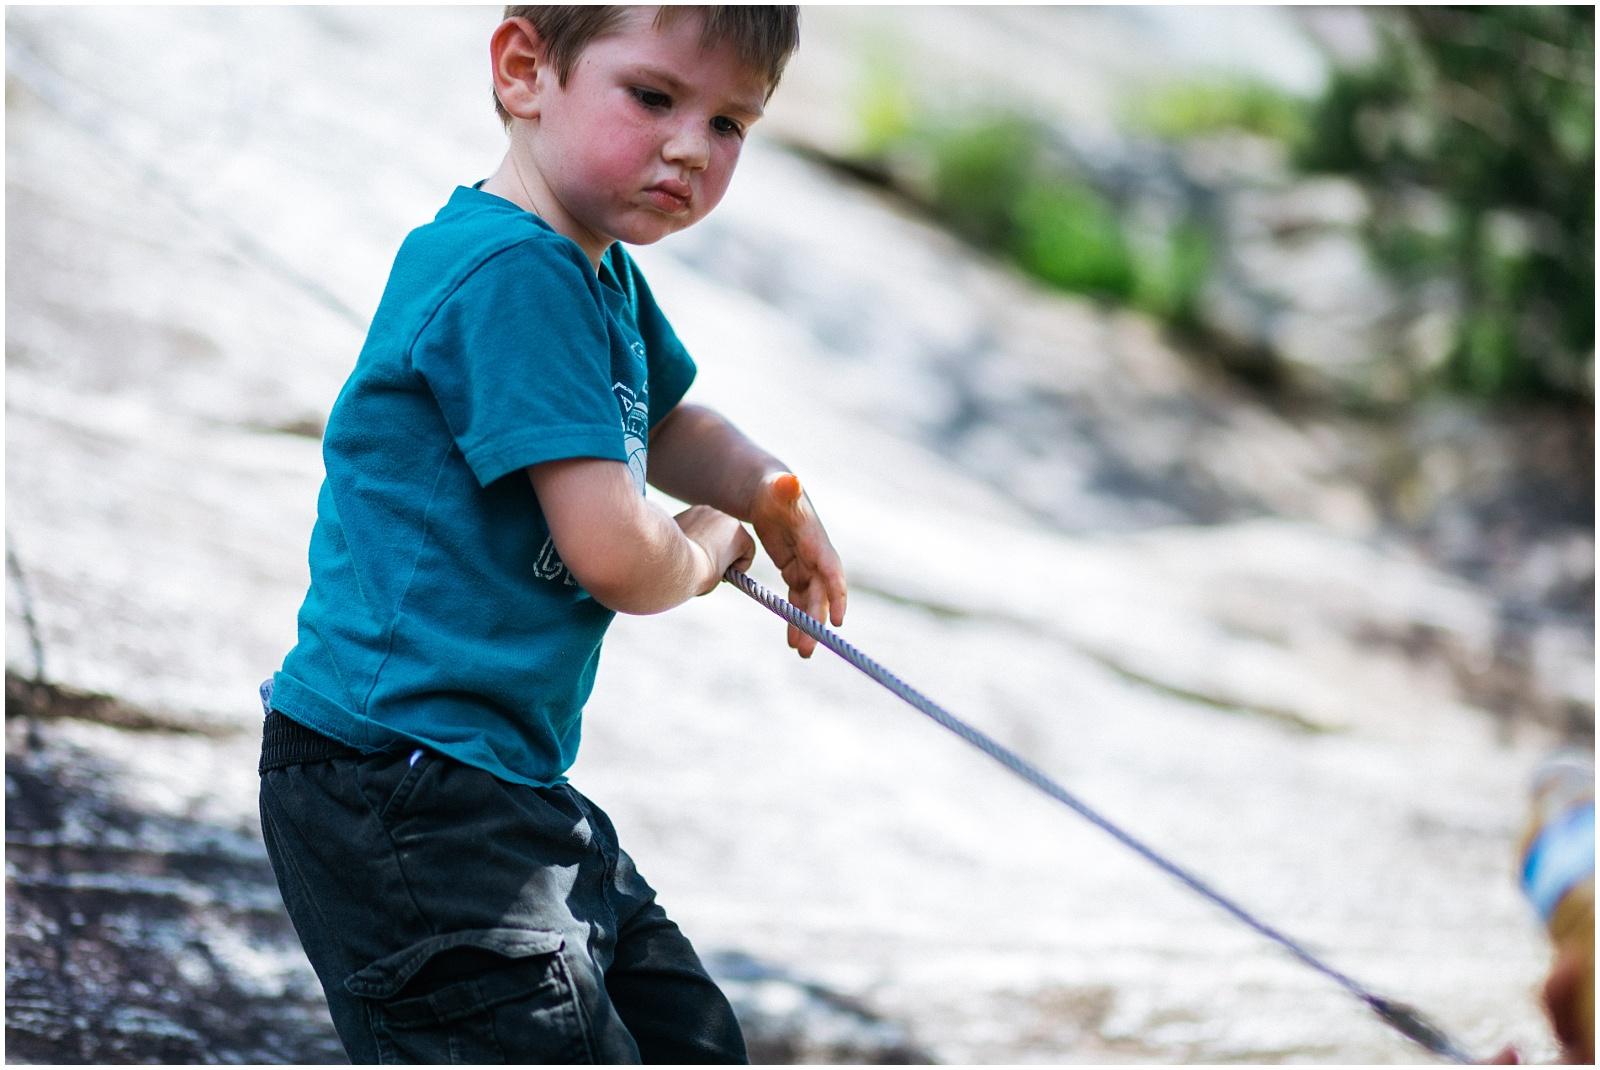 Child climbing ropes